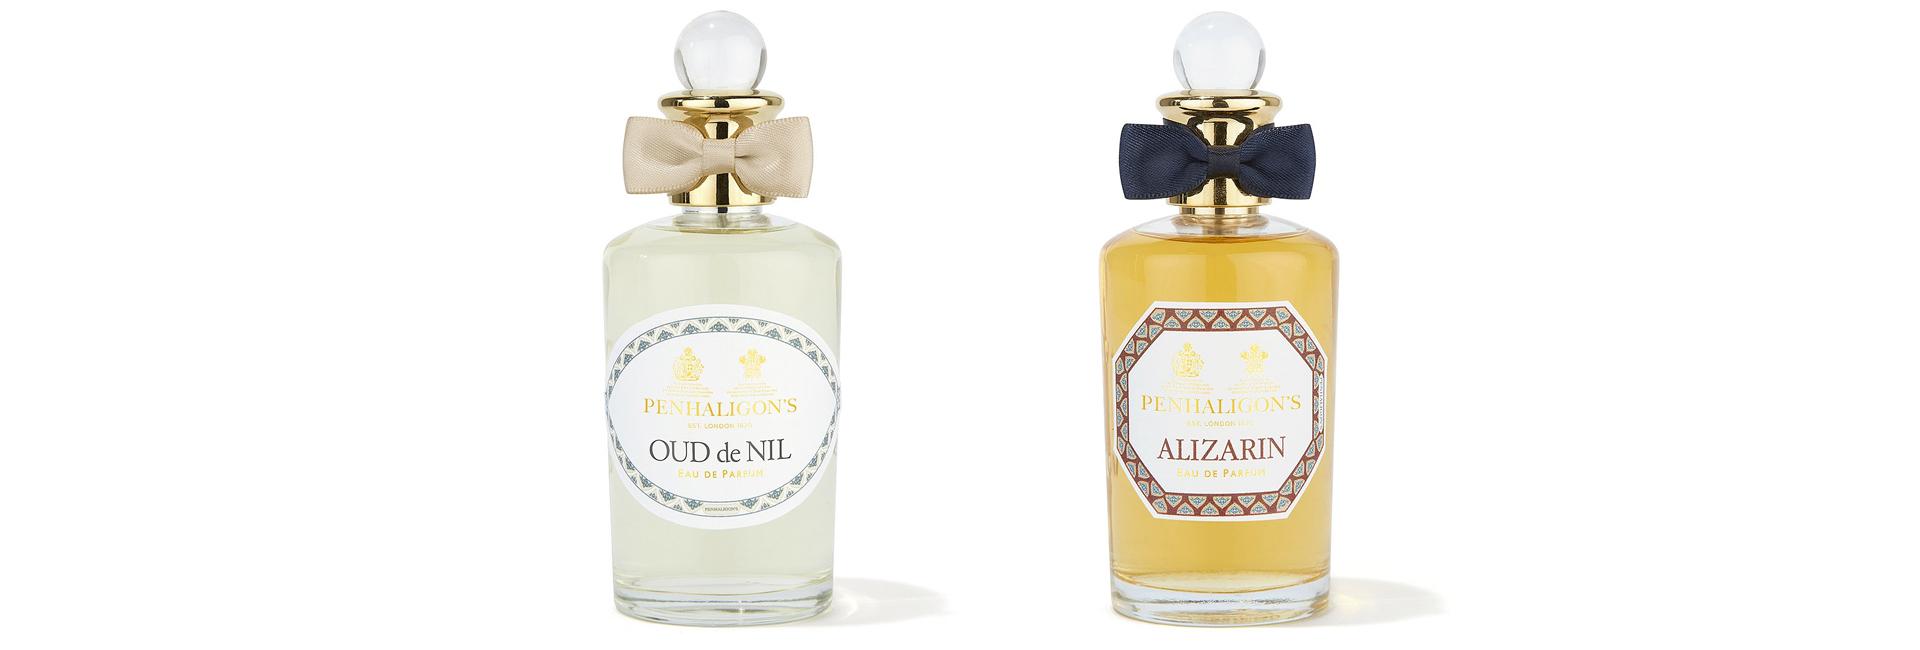 oud-de-nil-alizarin-penhaligon-blog-beaute-soin-parfum-homme